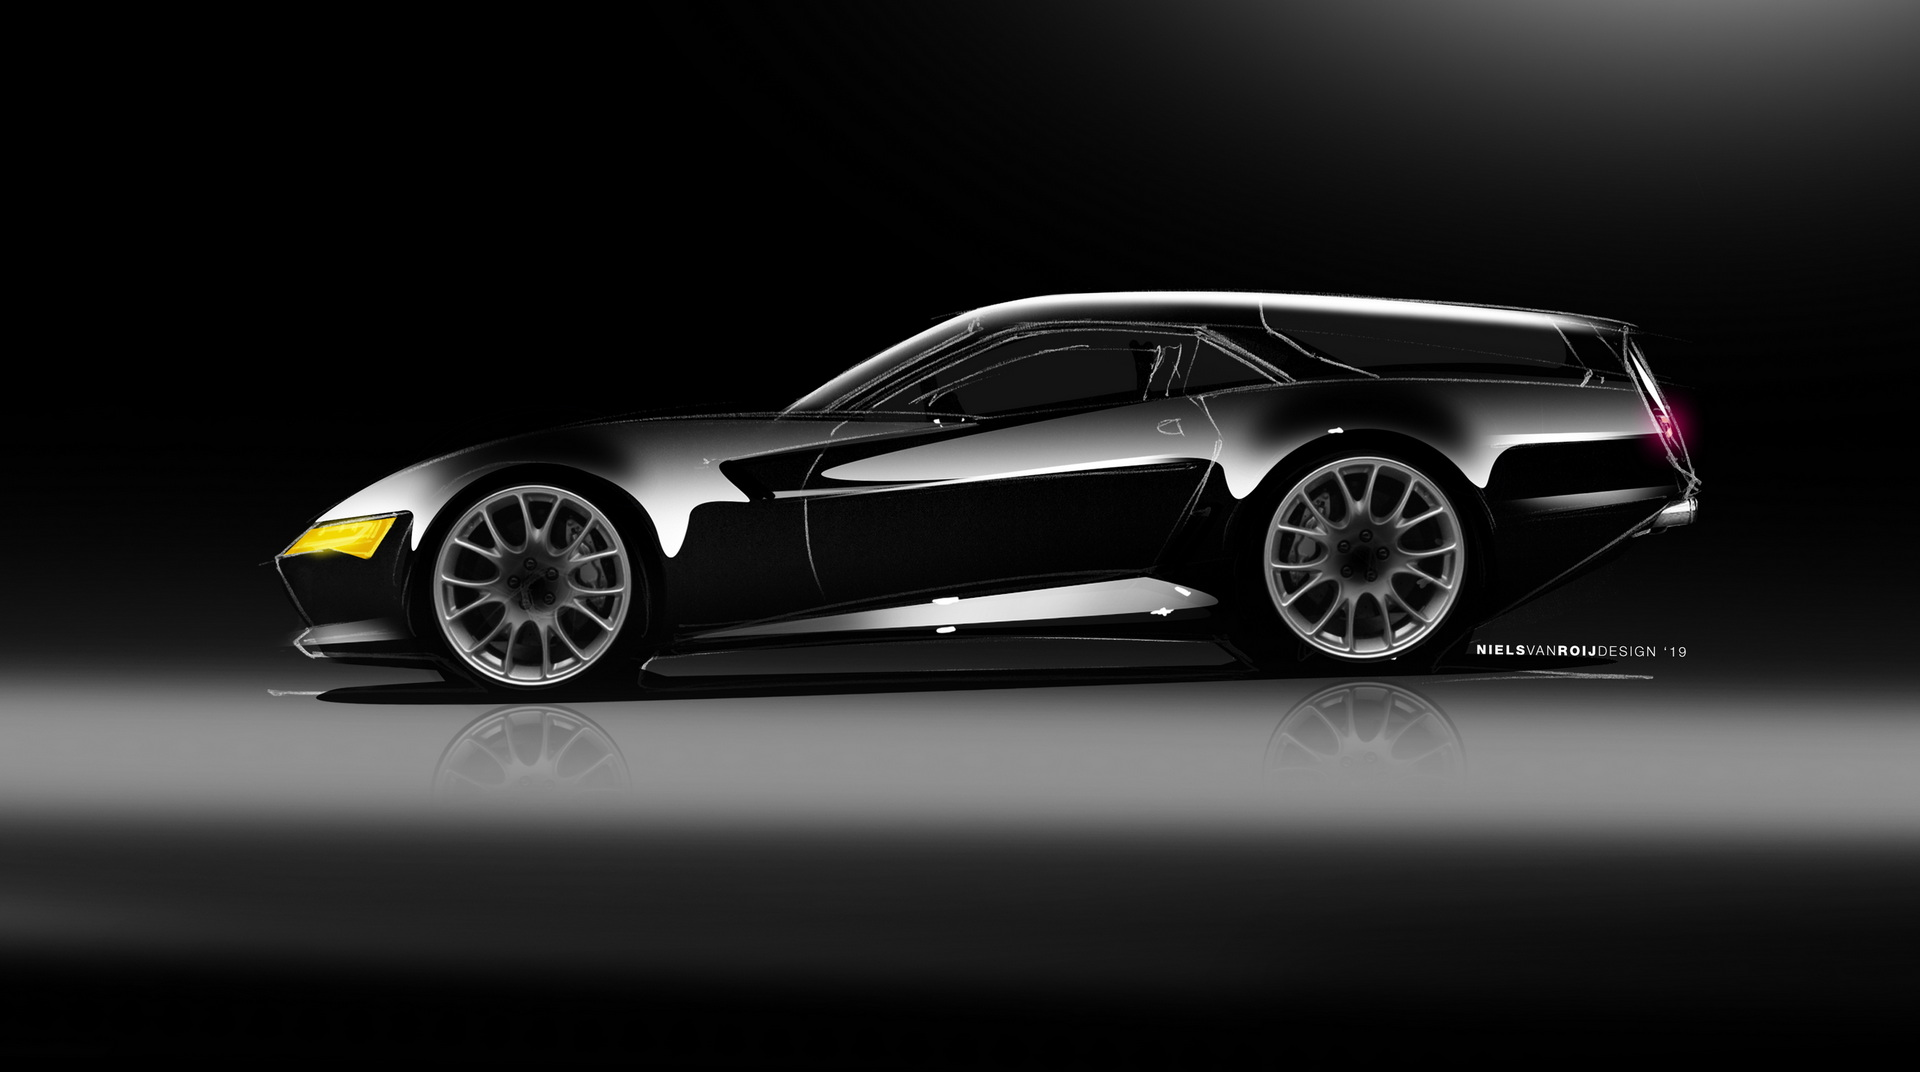 Ferrari-Daytona-Shooting-Brake-Hommage-by-Niels-van-Roij-Design-6